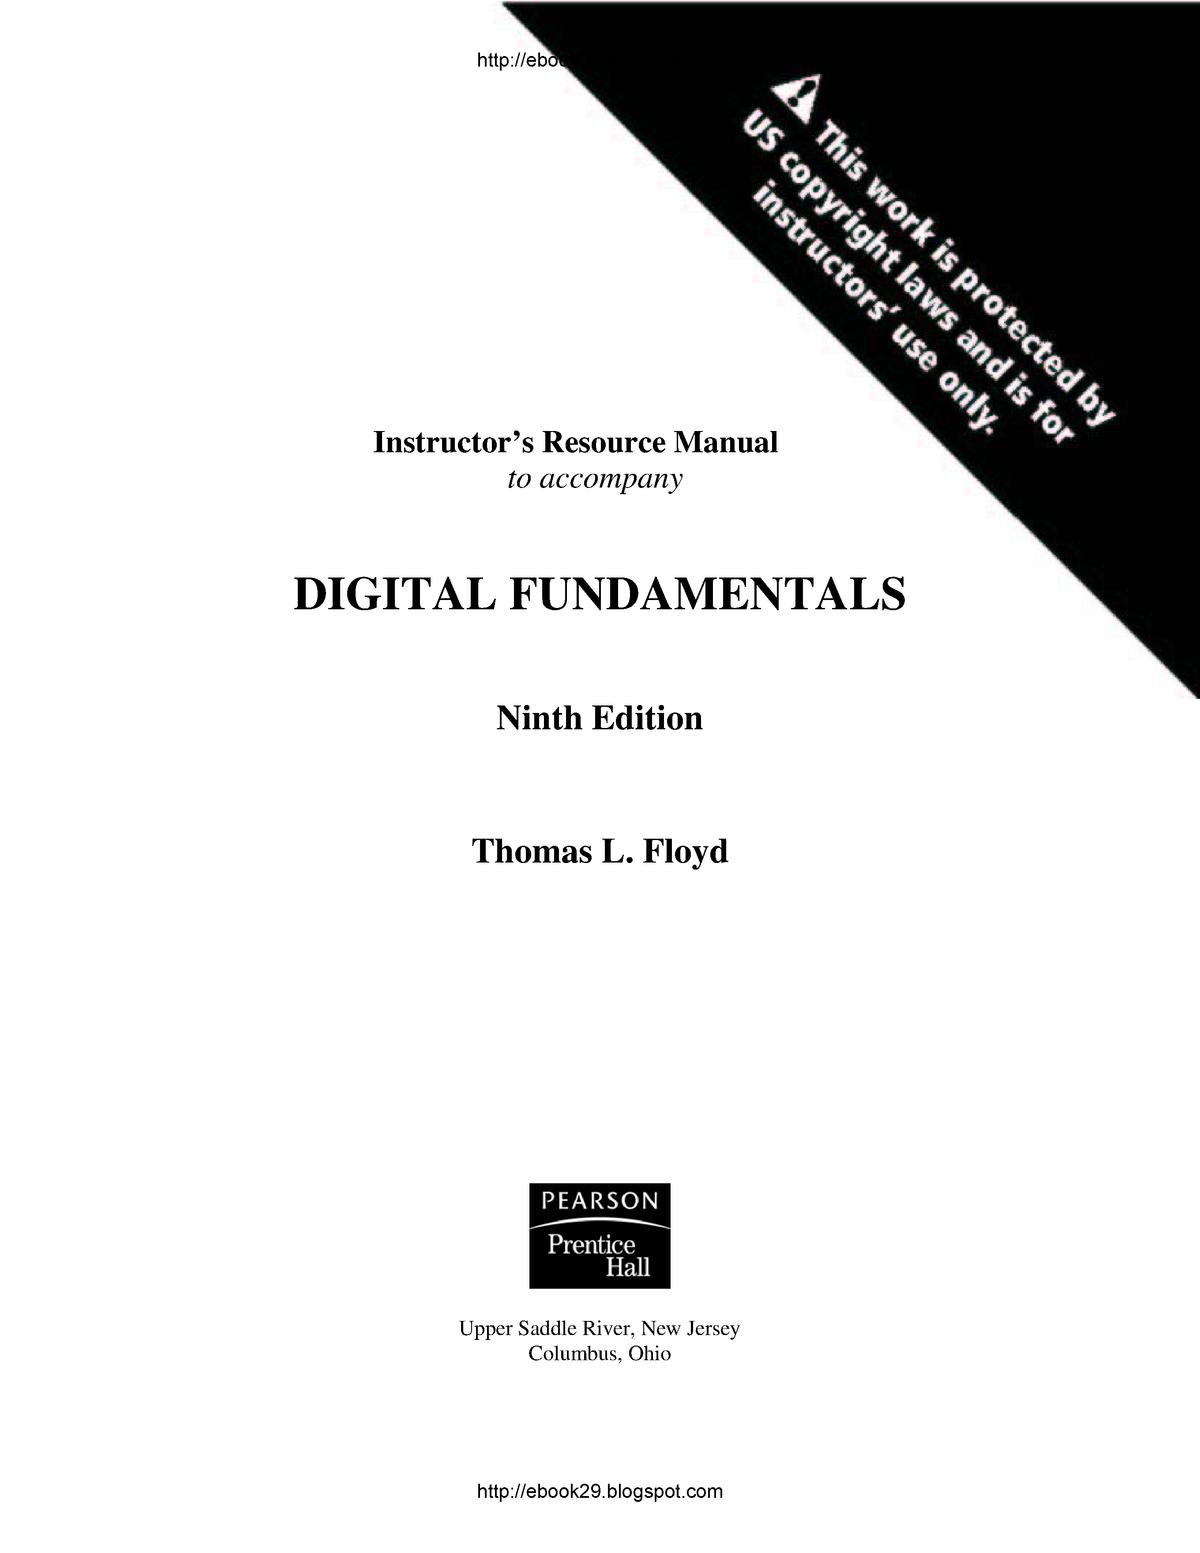 Solutions Manual Digital Fundamentals-Thomas LFloyd - cse114